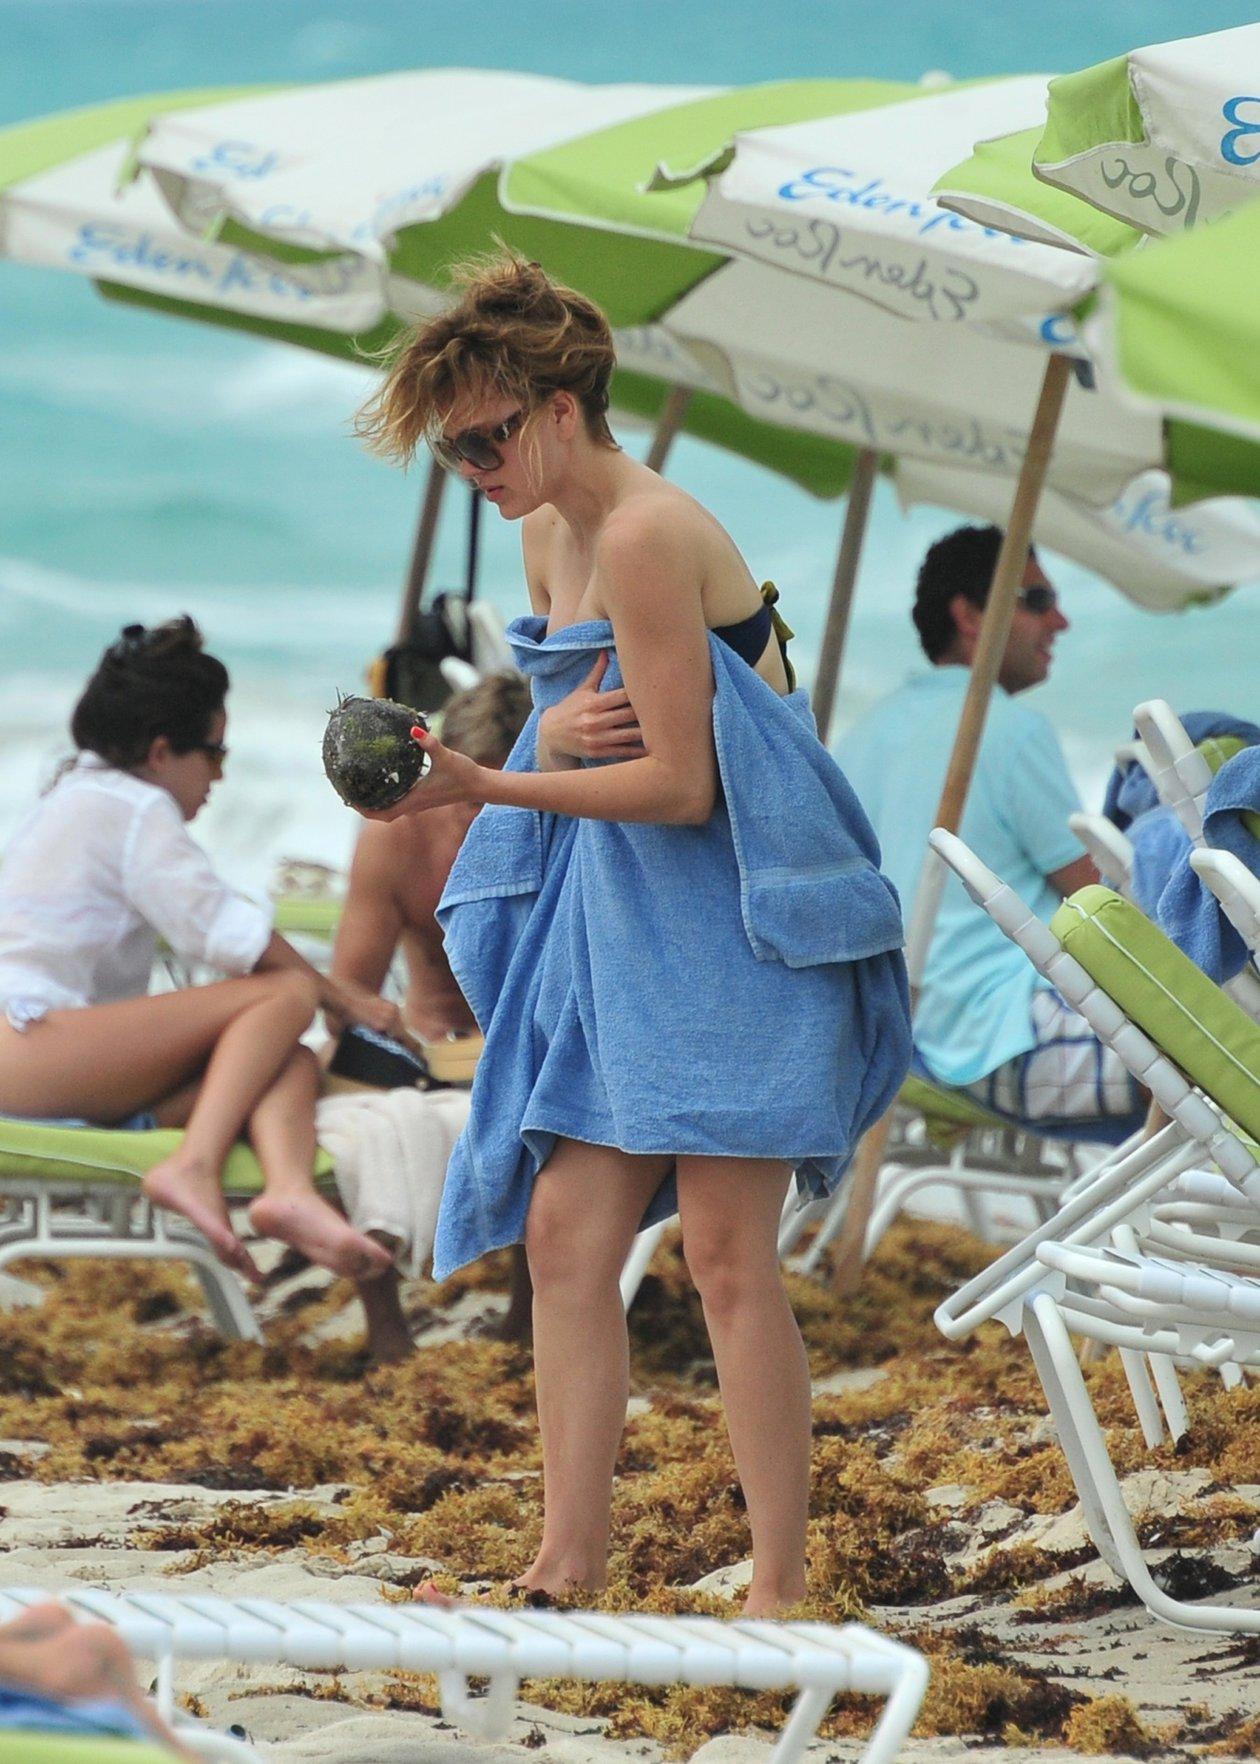 Aimee teegarden bikini photos — img 5